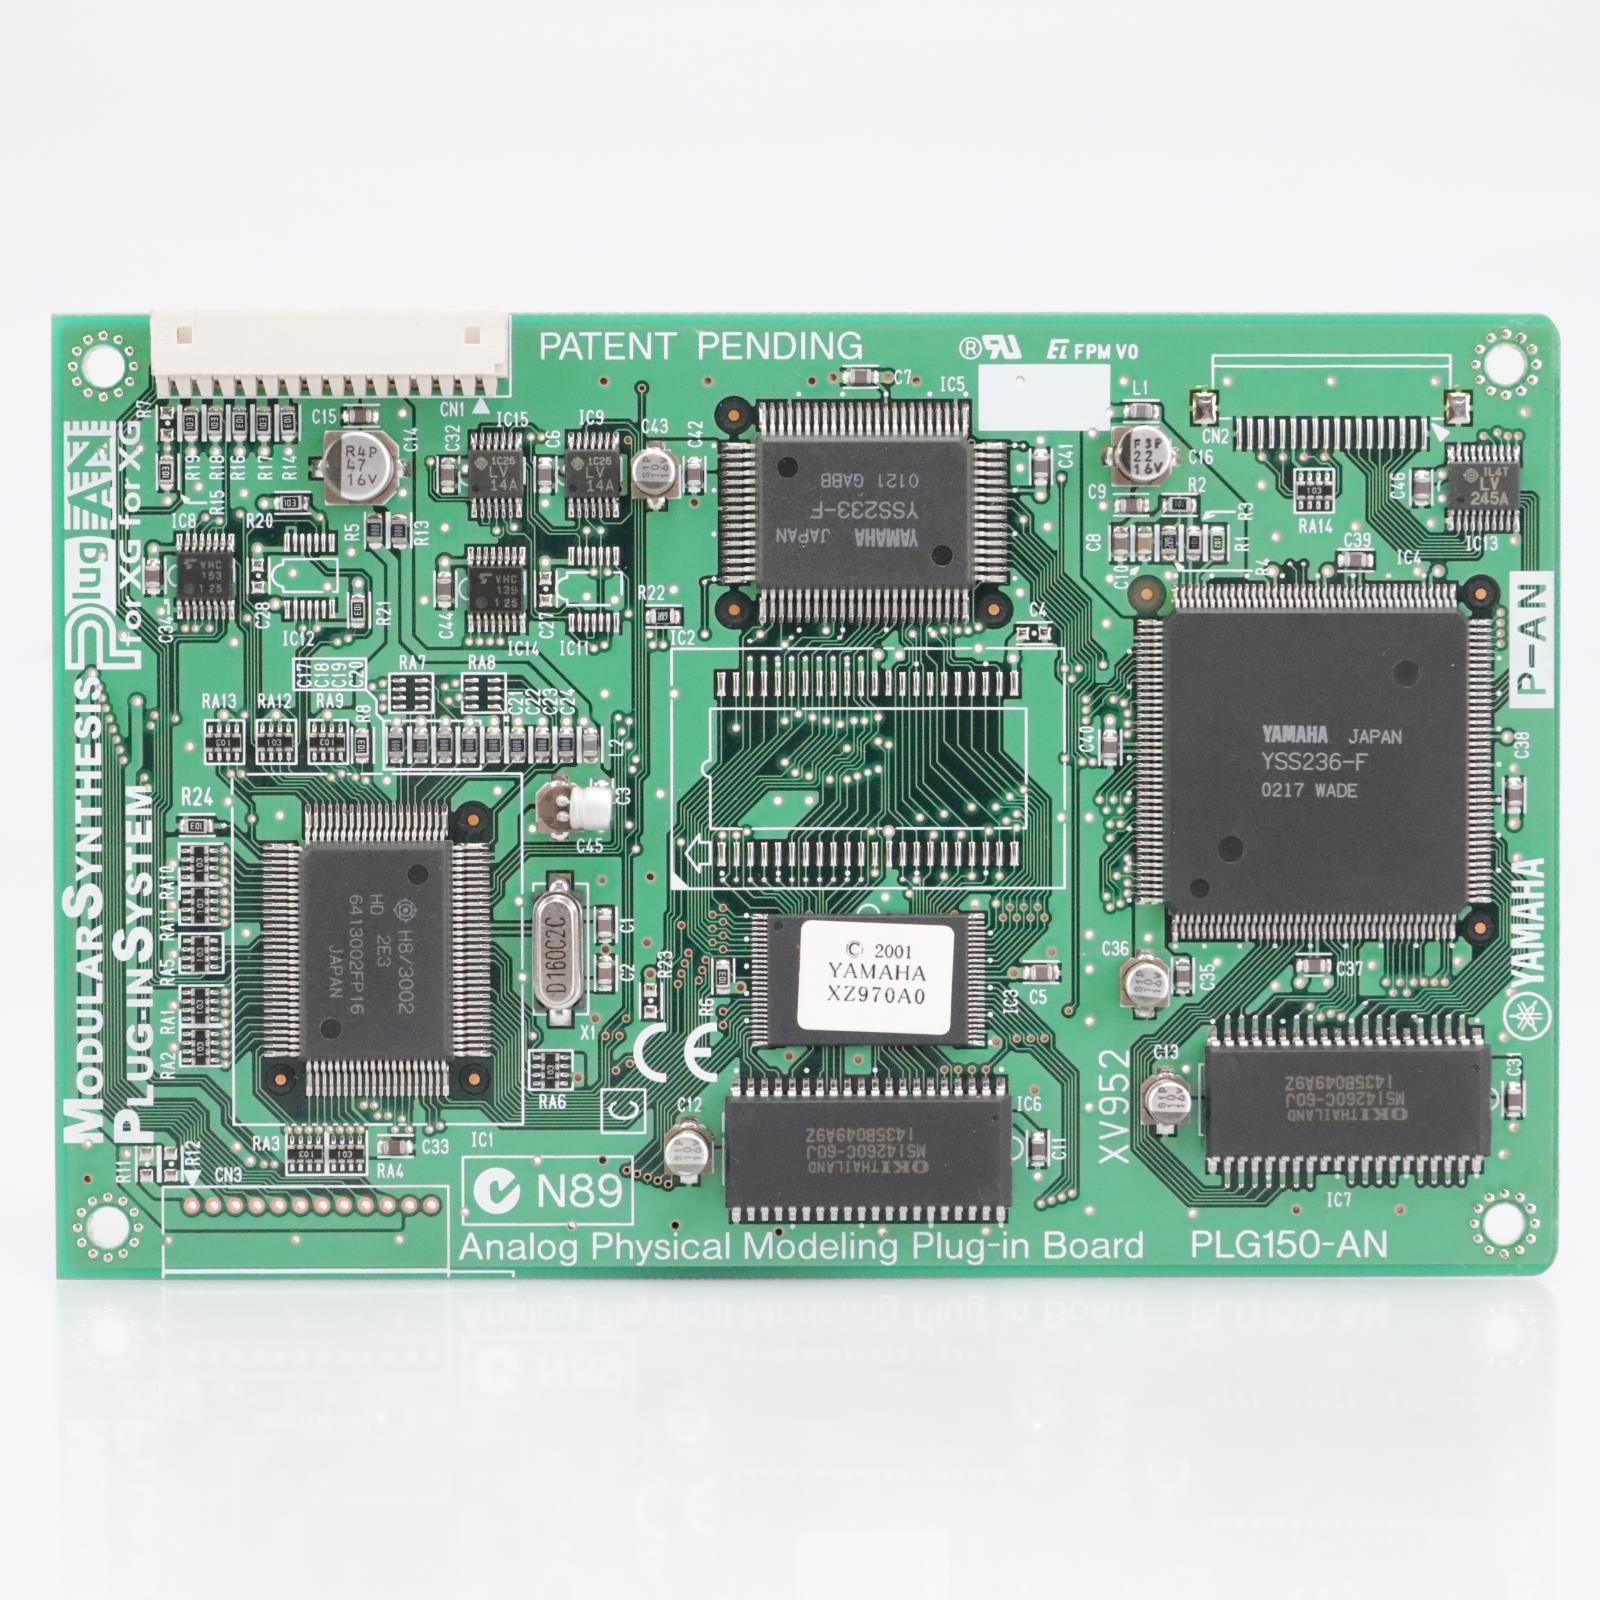 Yamaha PLG150-AN Analog Physical Modeling Plug-in Board w/ Box & Discs #41778